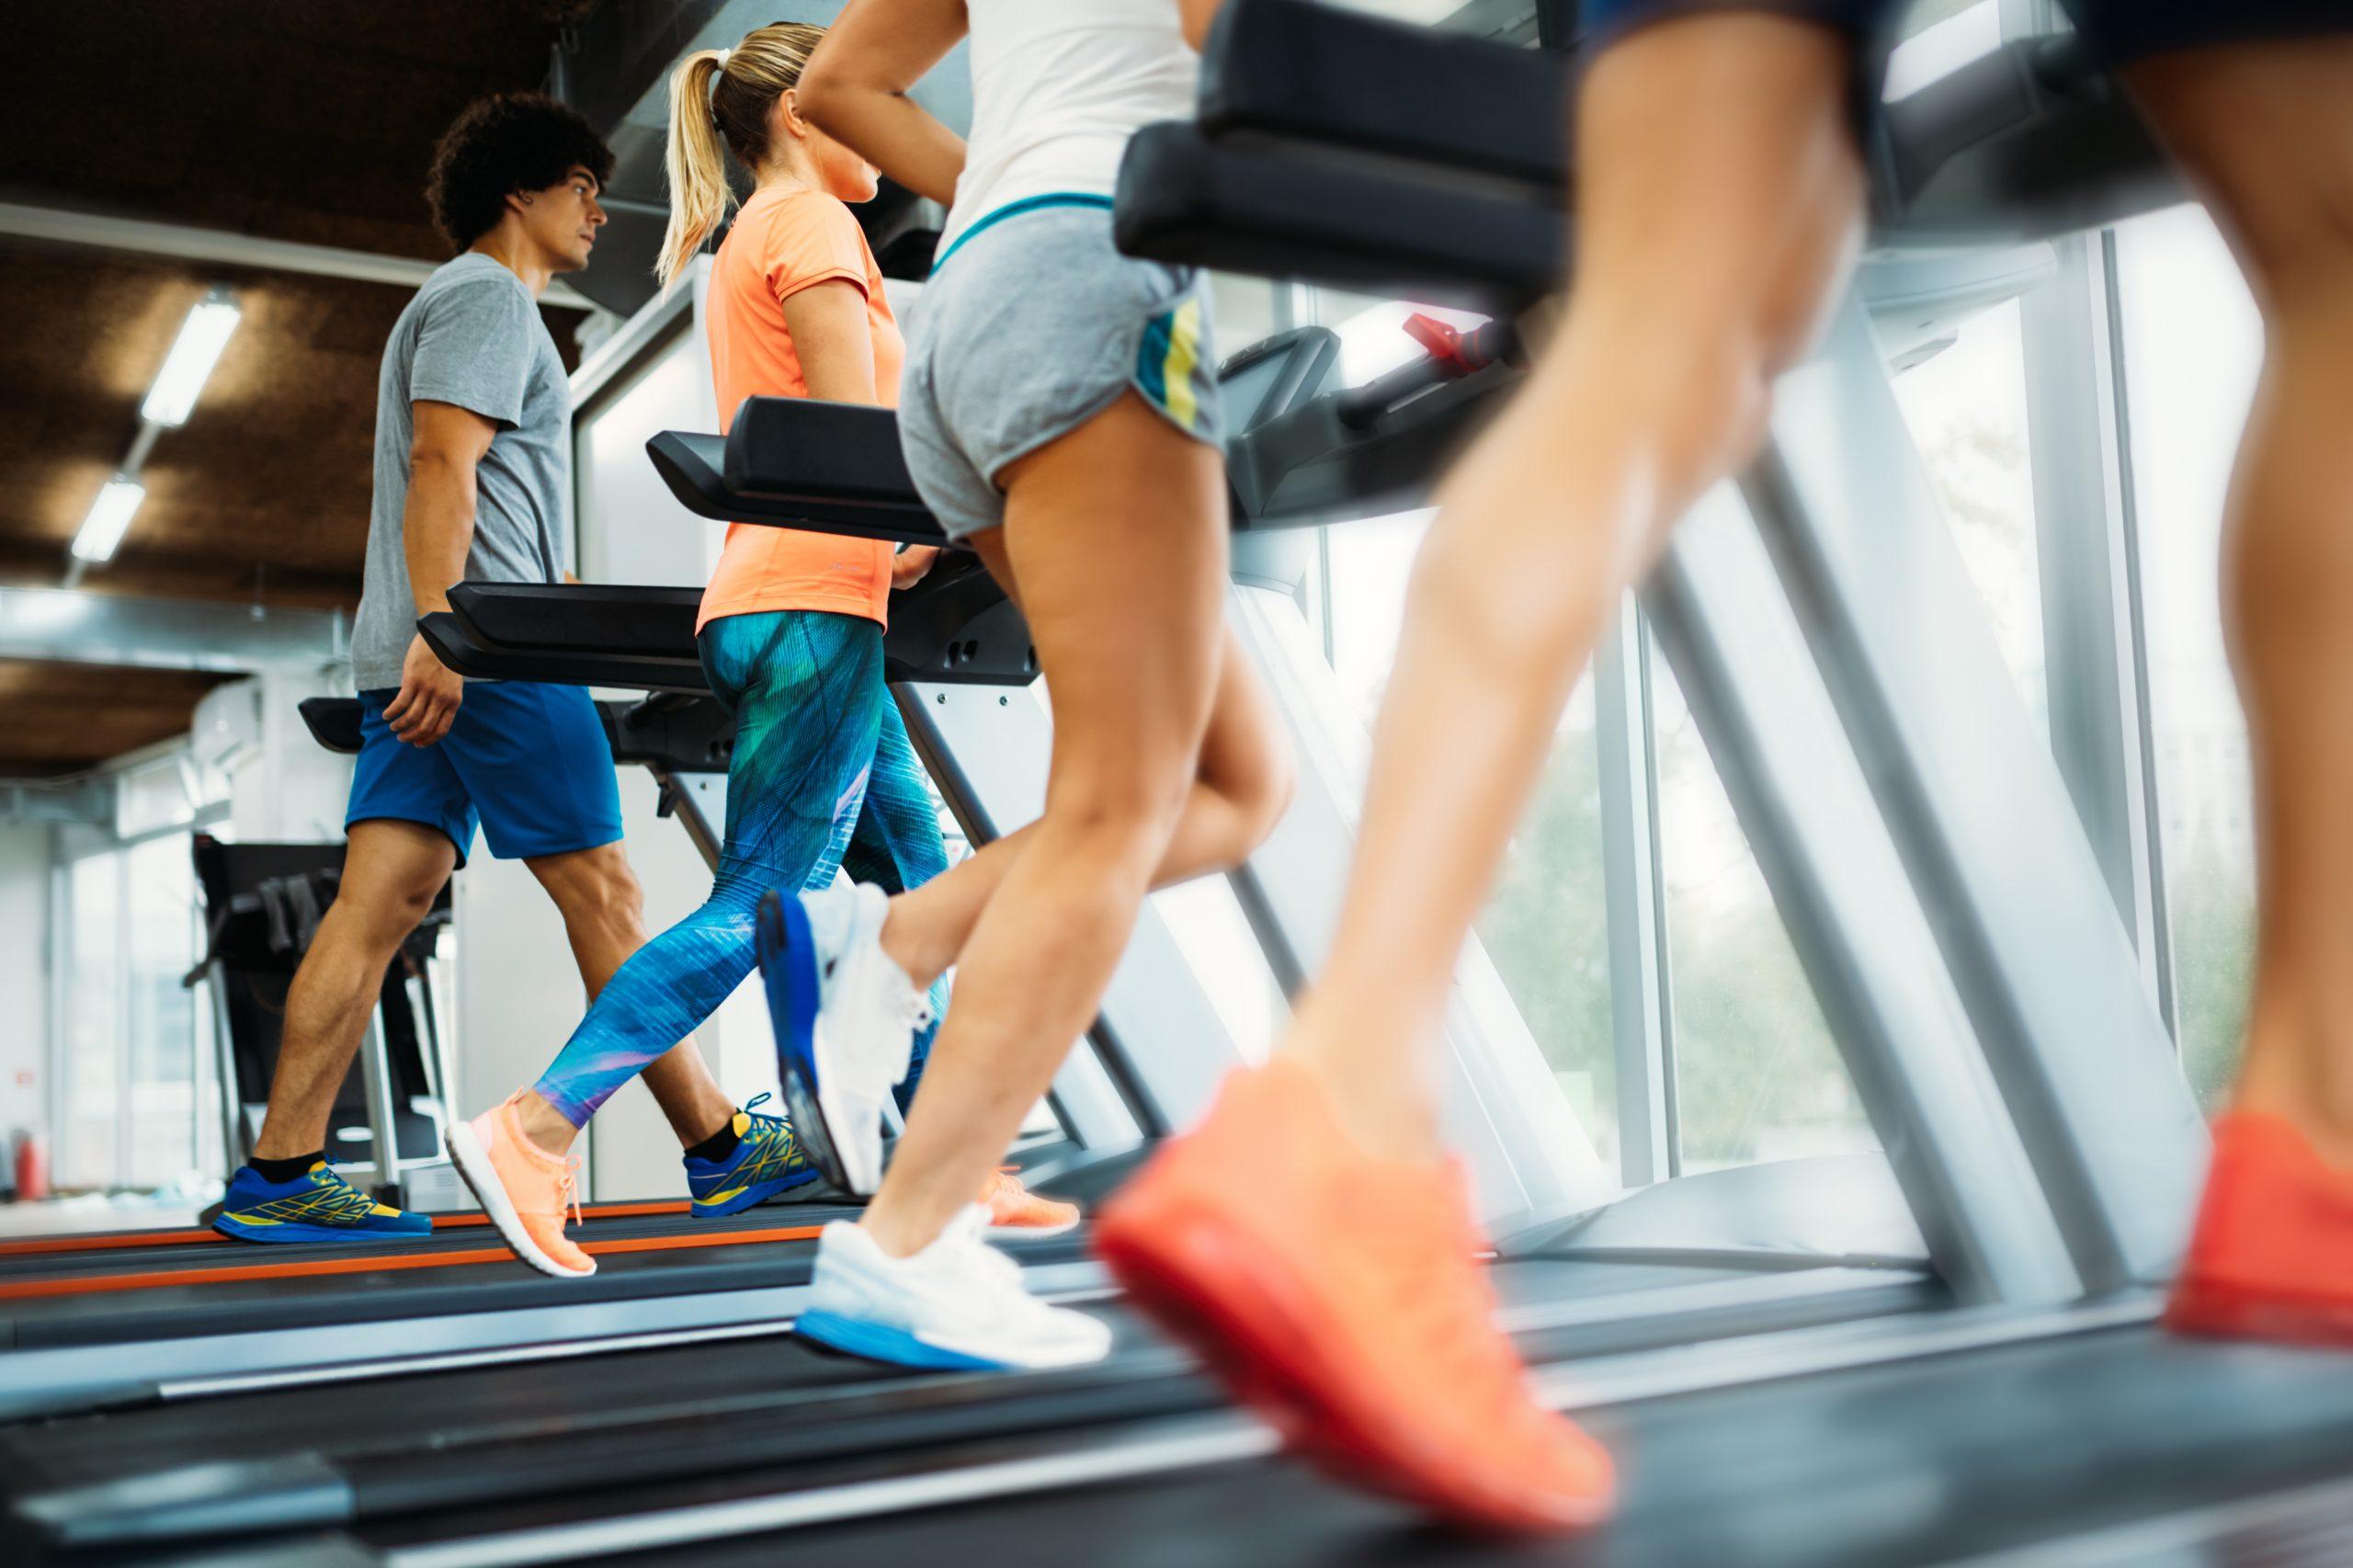 4 Reasons to Start Training Cardio ASAP